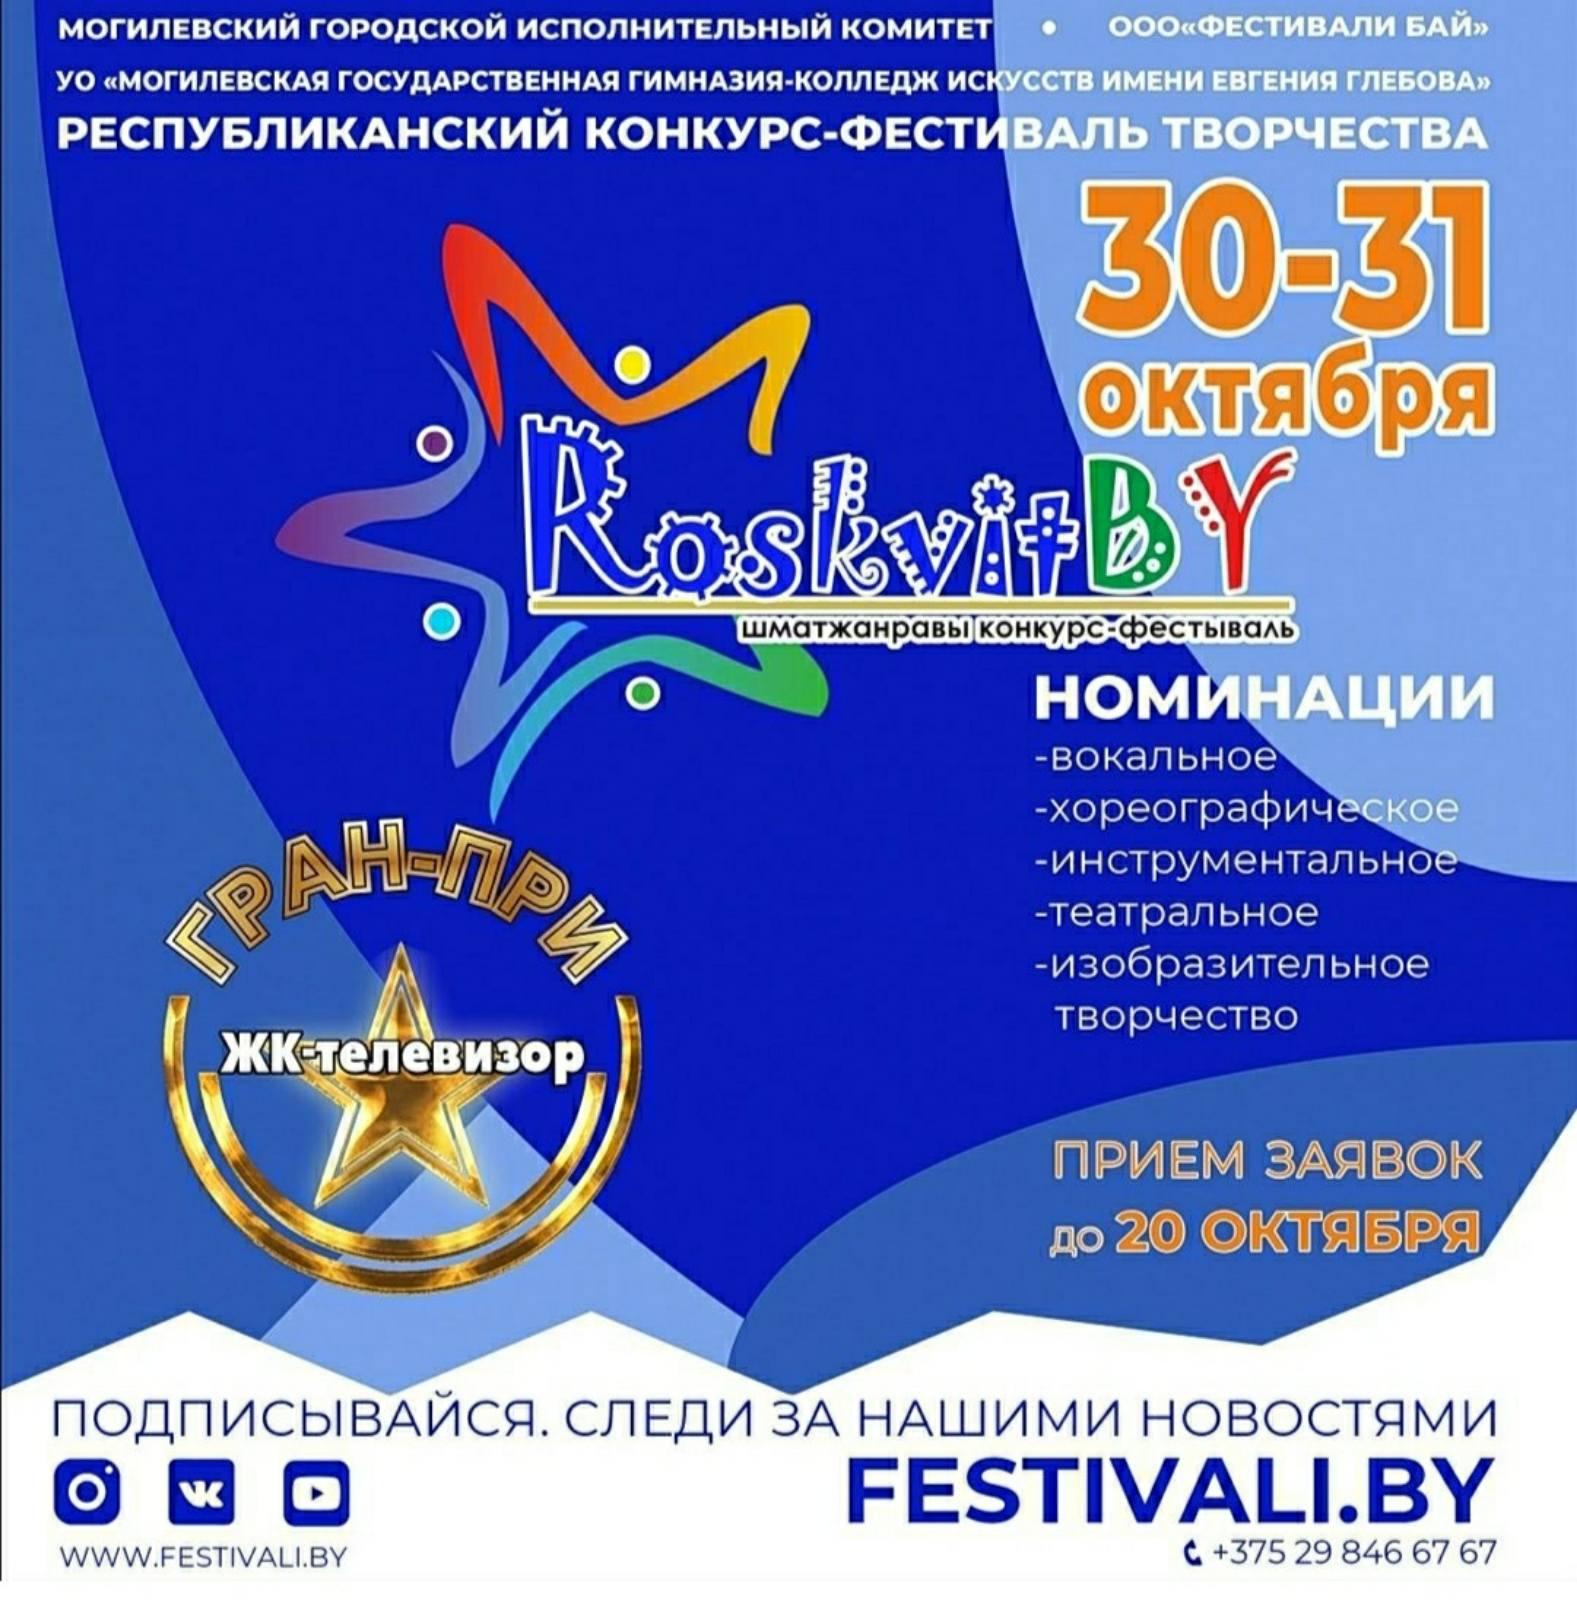 Стартовал прием заявок научастие вРеспубликанском многожанровом конкурсе-фестивале  «RoskvitBY»